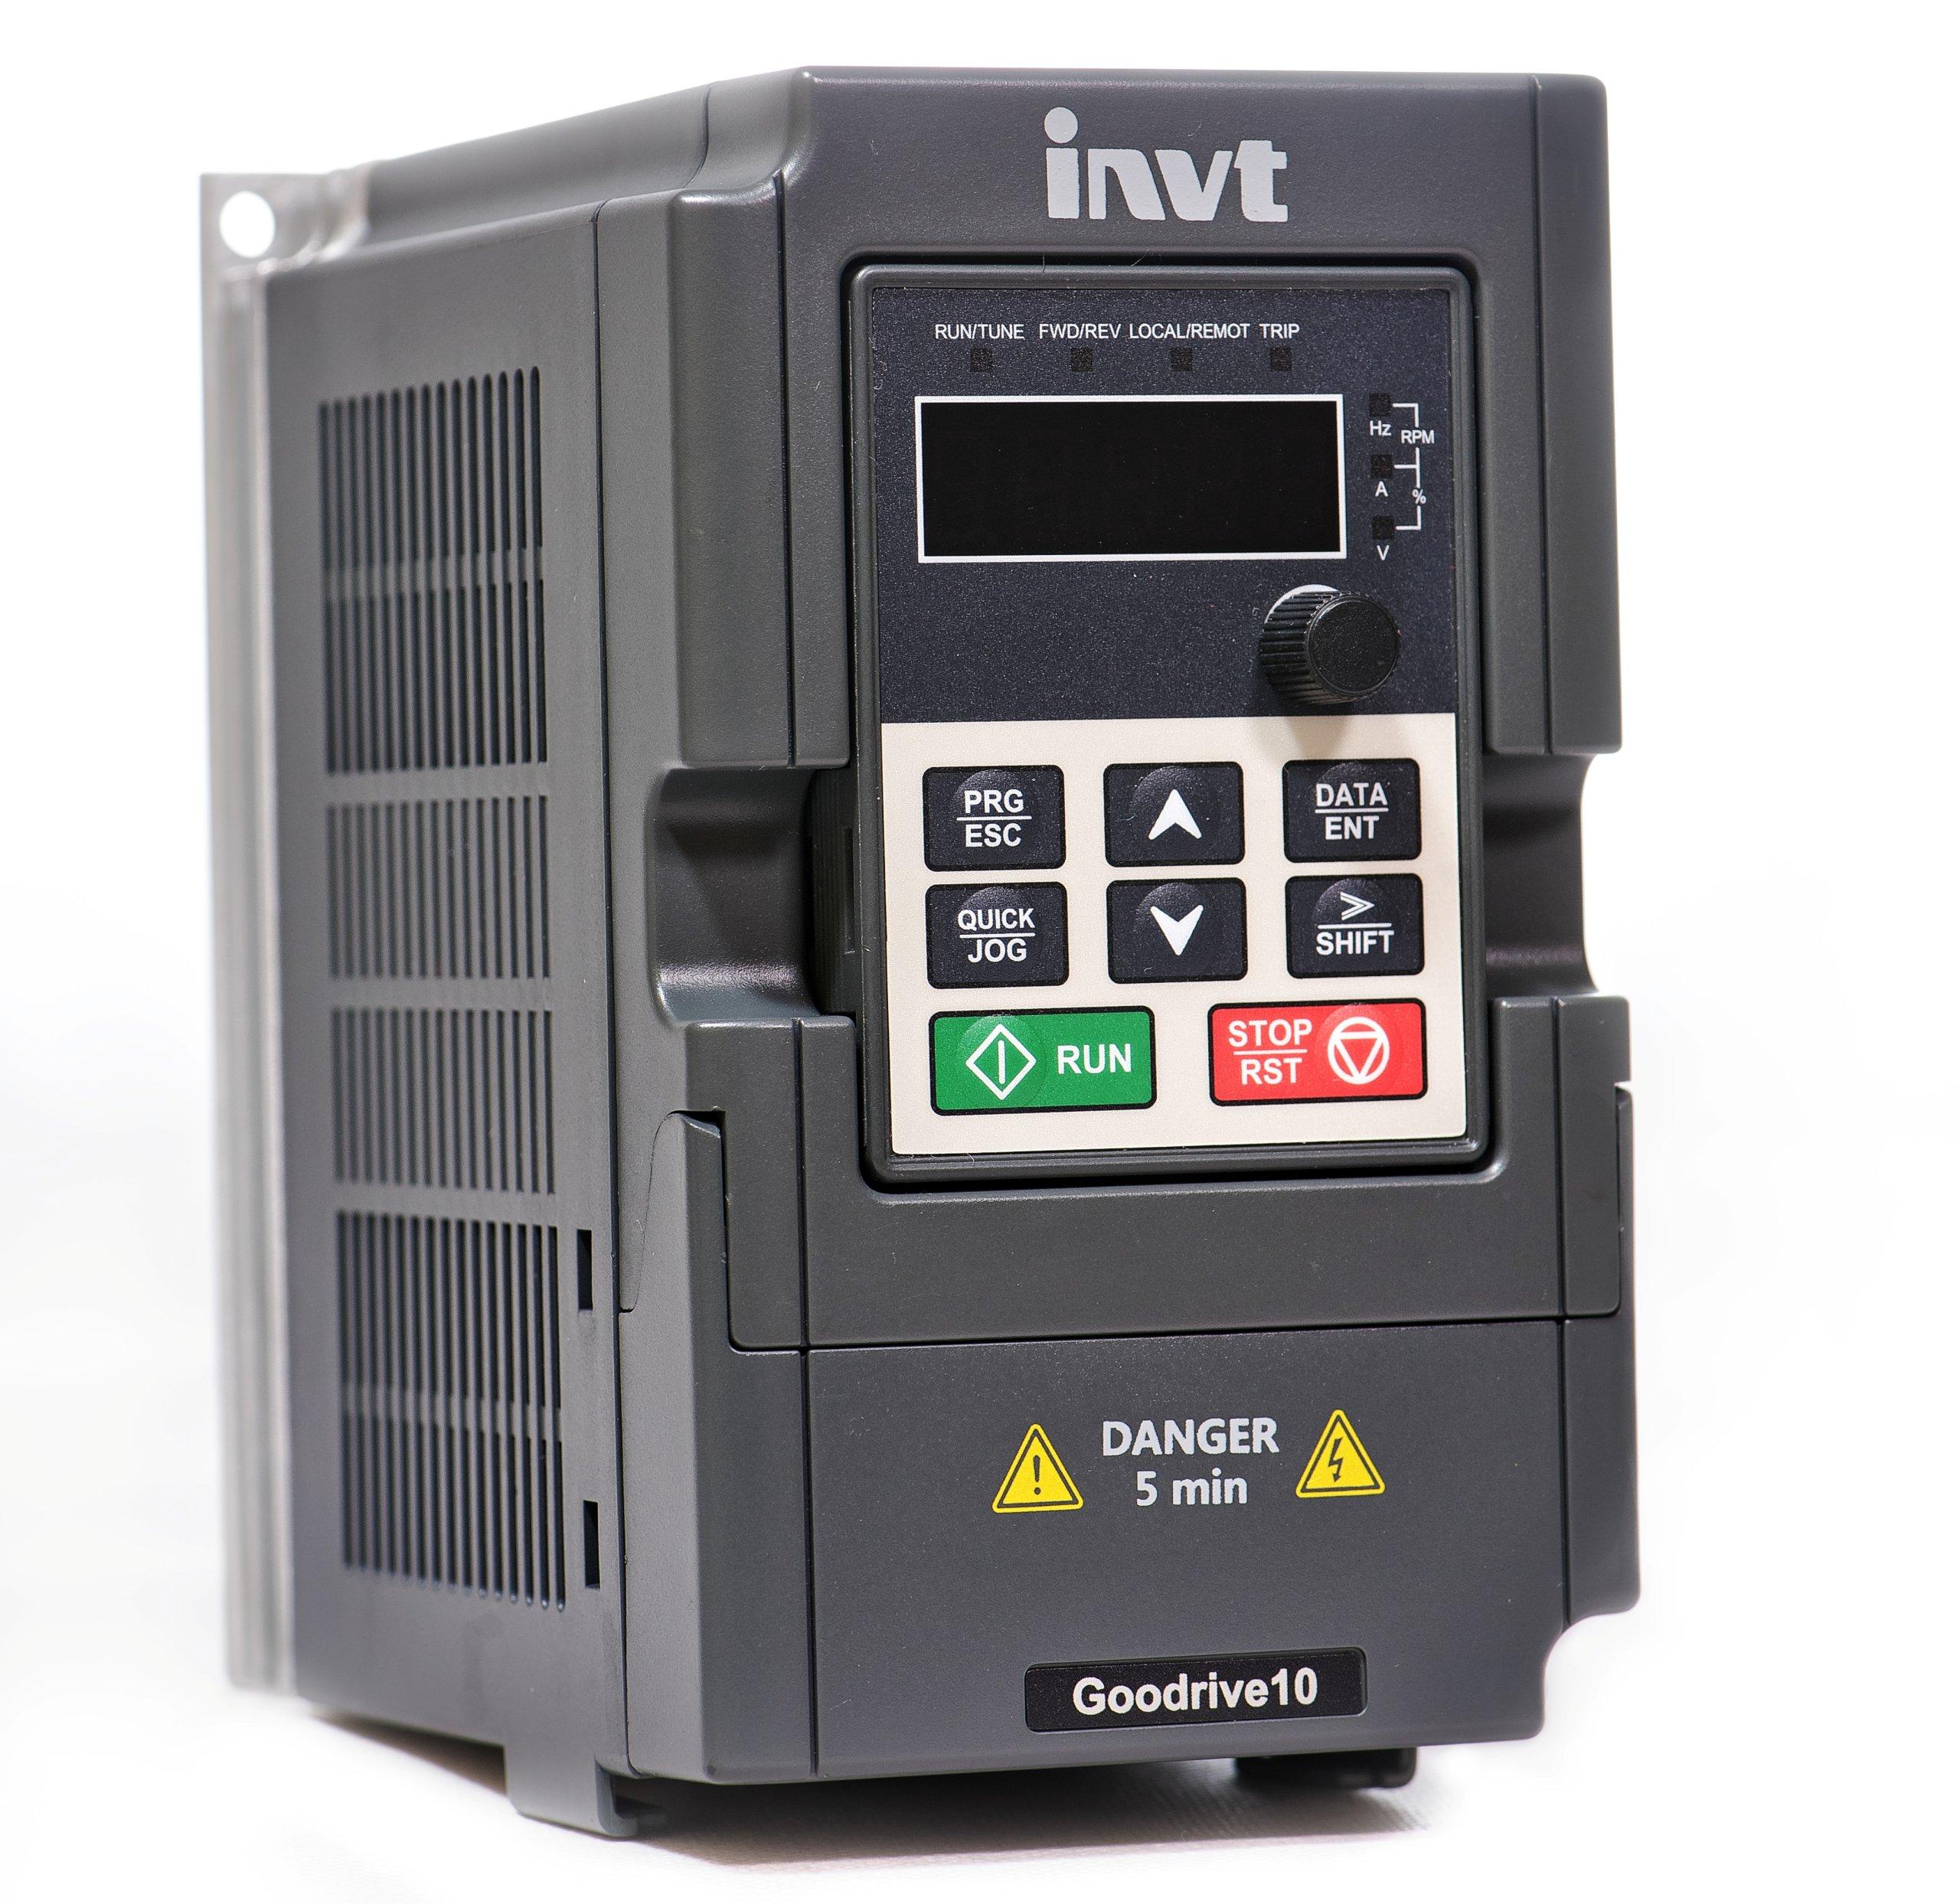 Falownik INVT 0,4kW 1F skalarny GWARANCJA 2 LATA